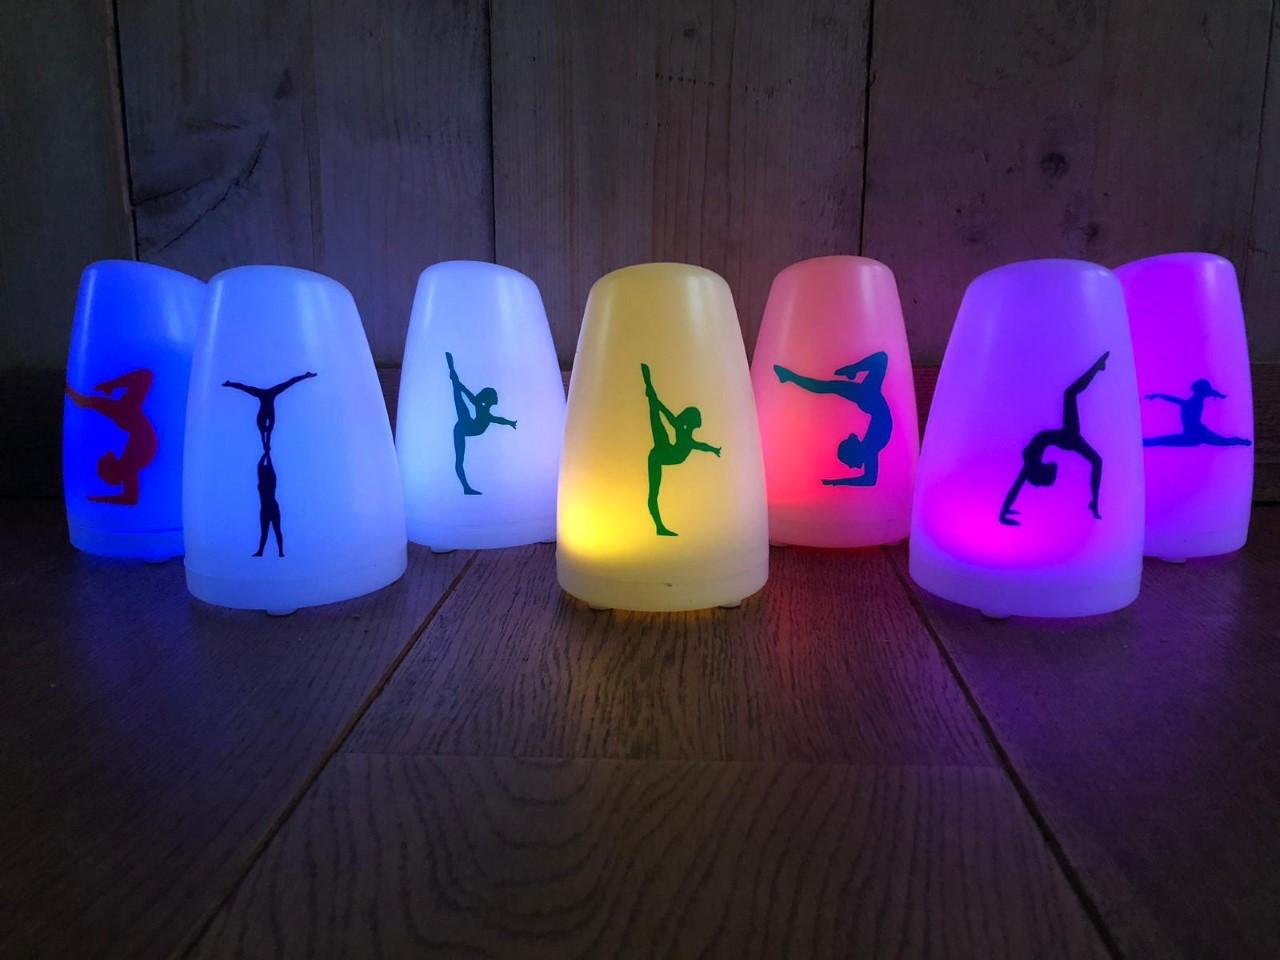 Turnlampje